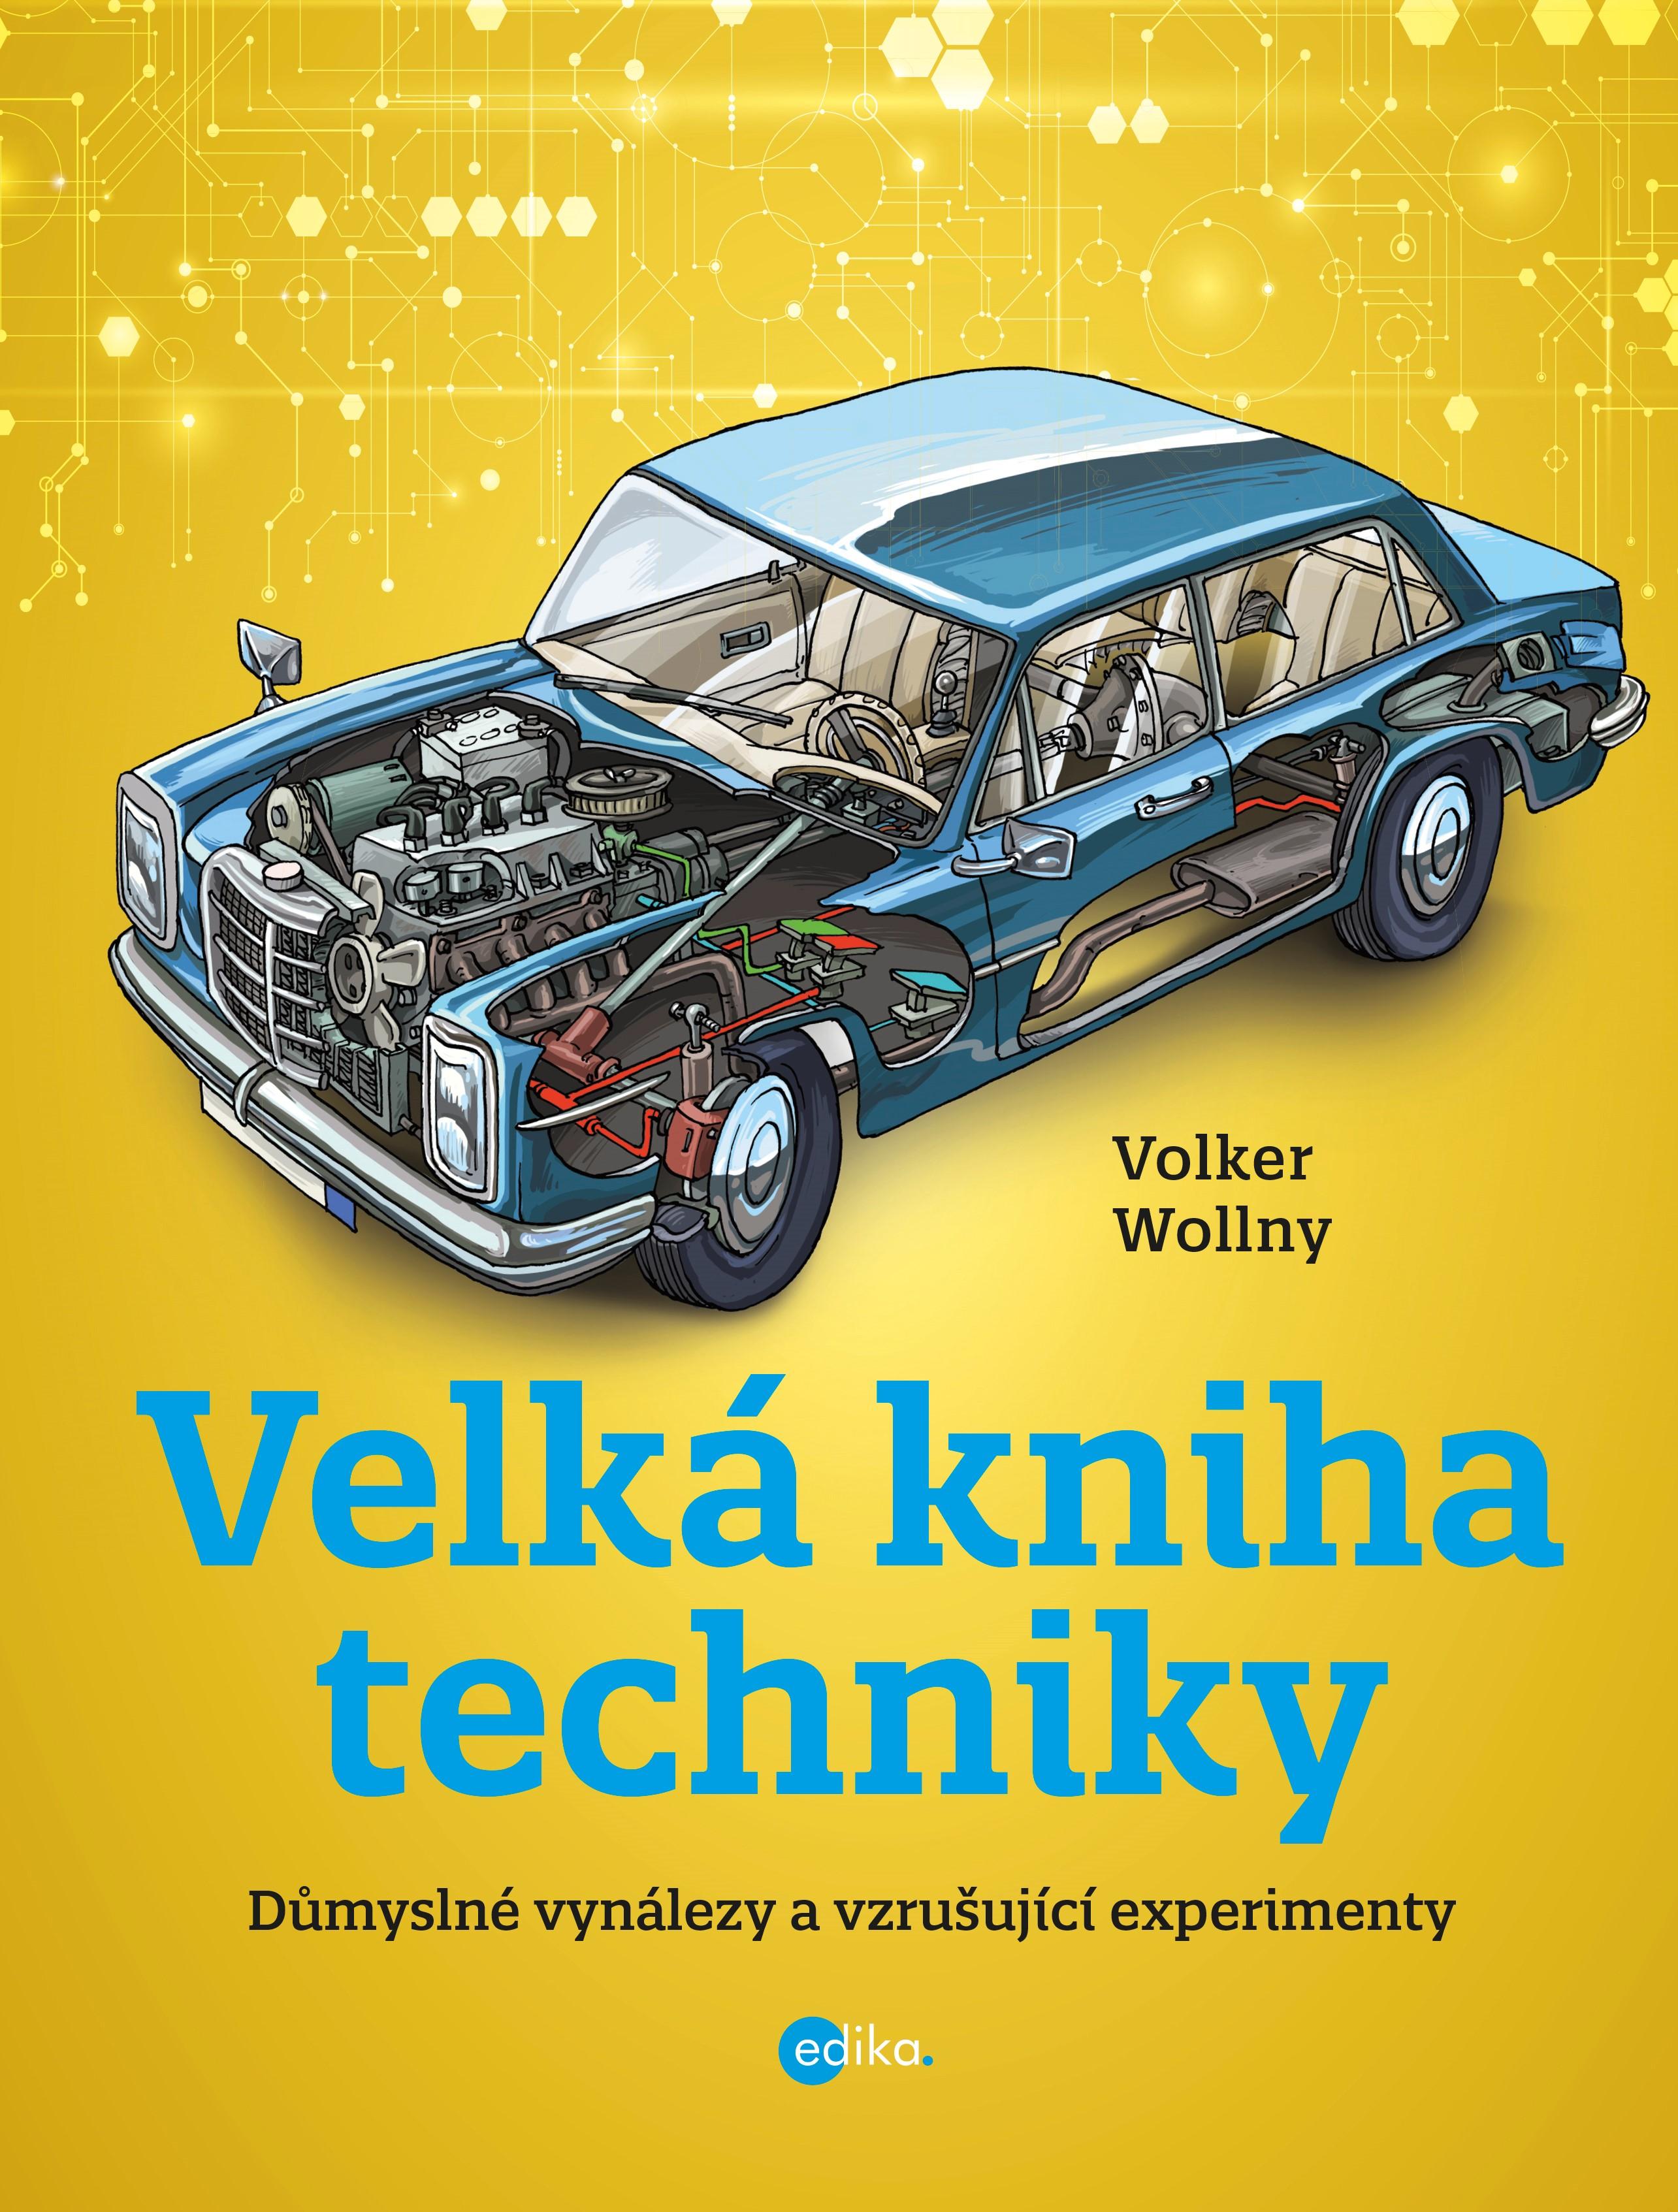 Velká kniha techniky